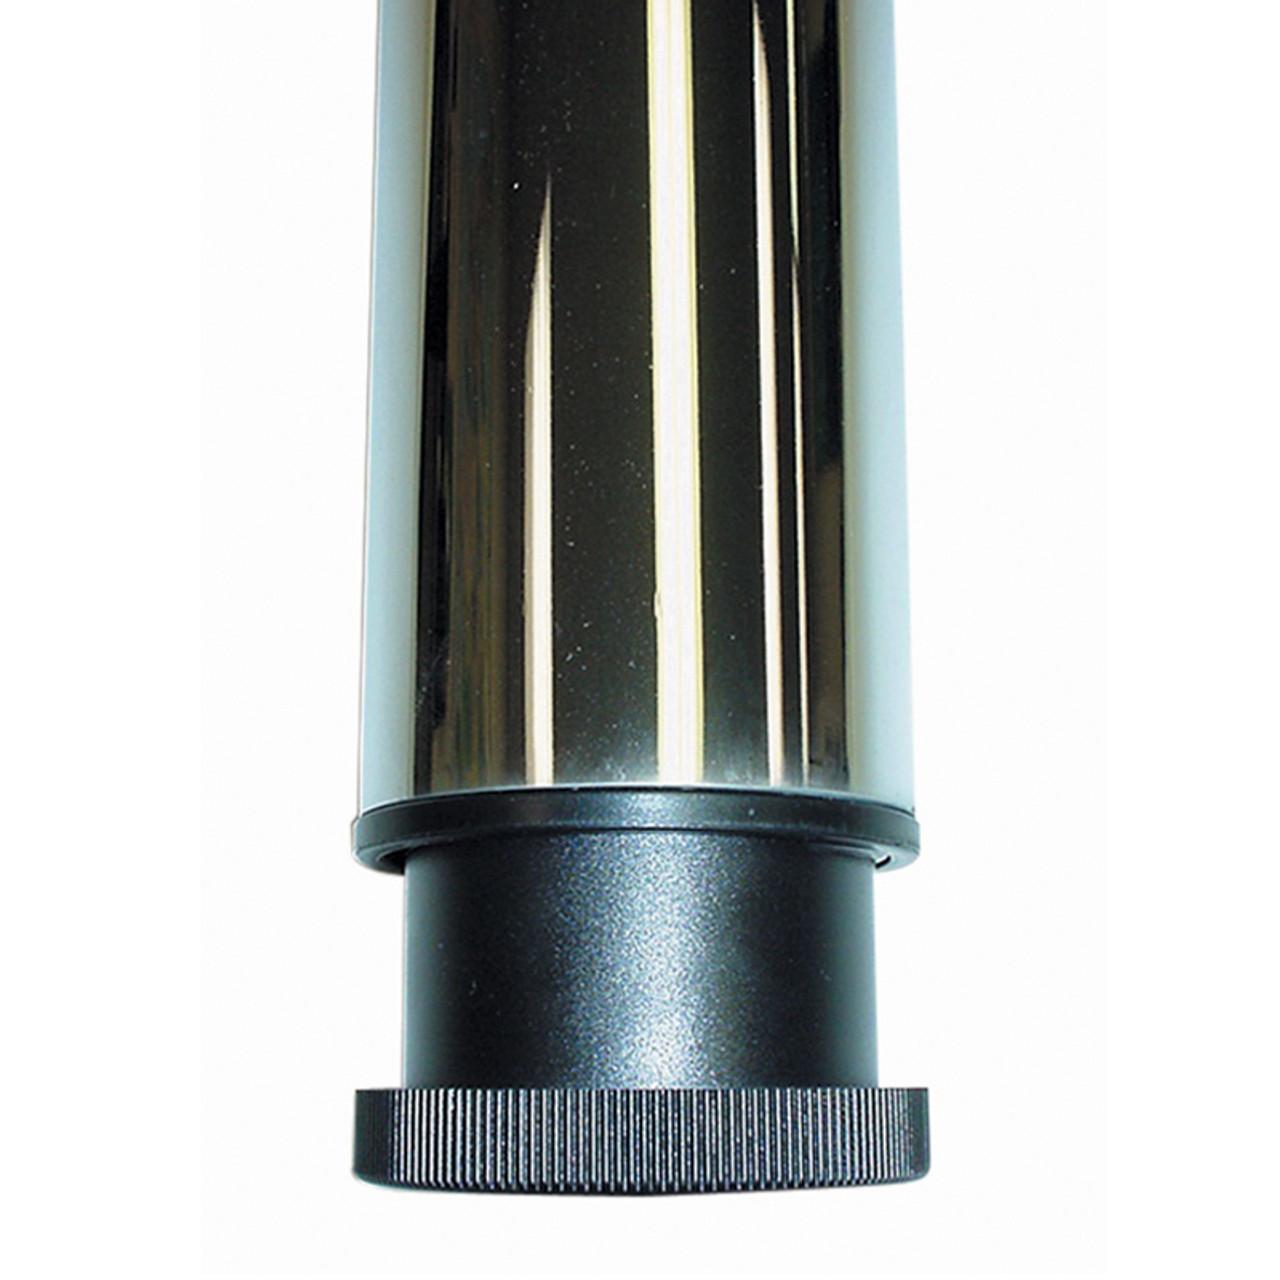 Prisma Metal Table Leg, 1-1/8'' adjustable foot - replacementtablelegs.com